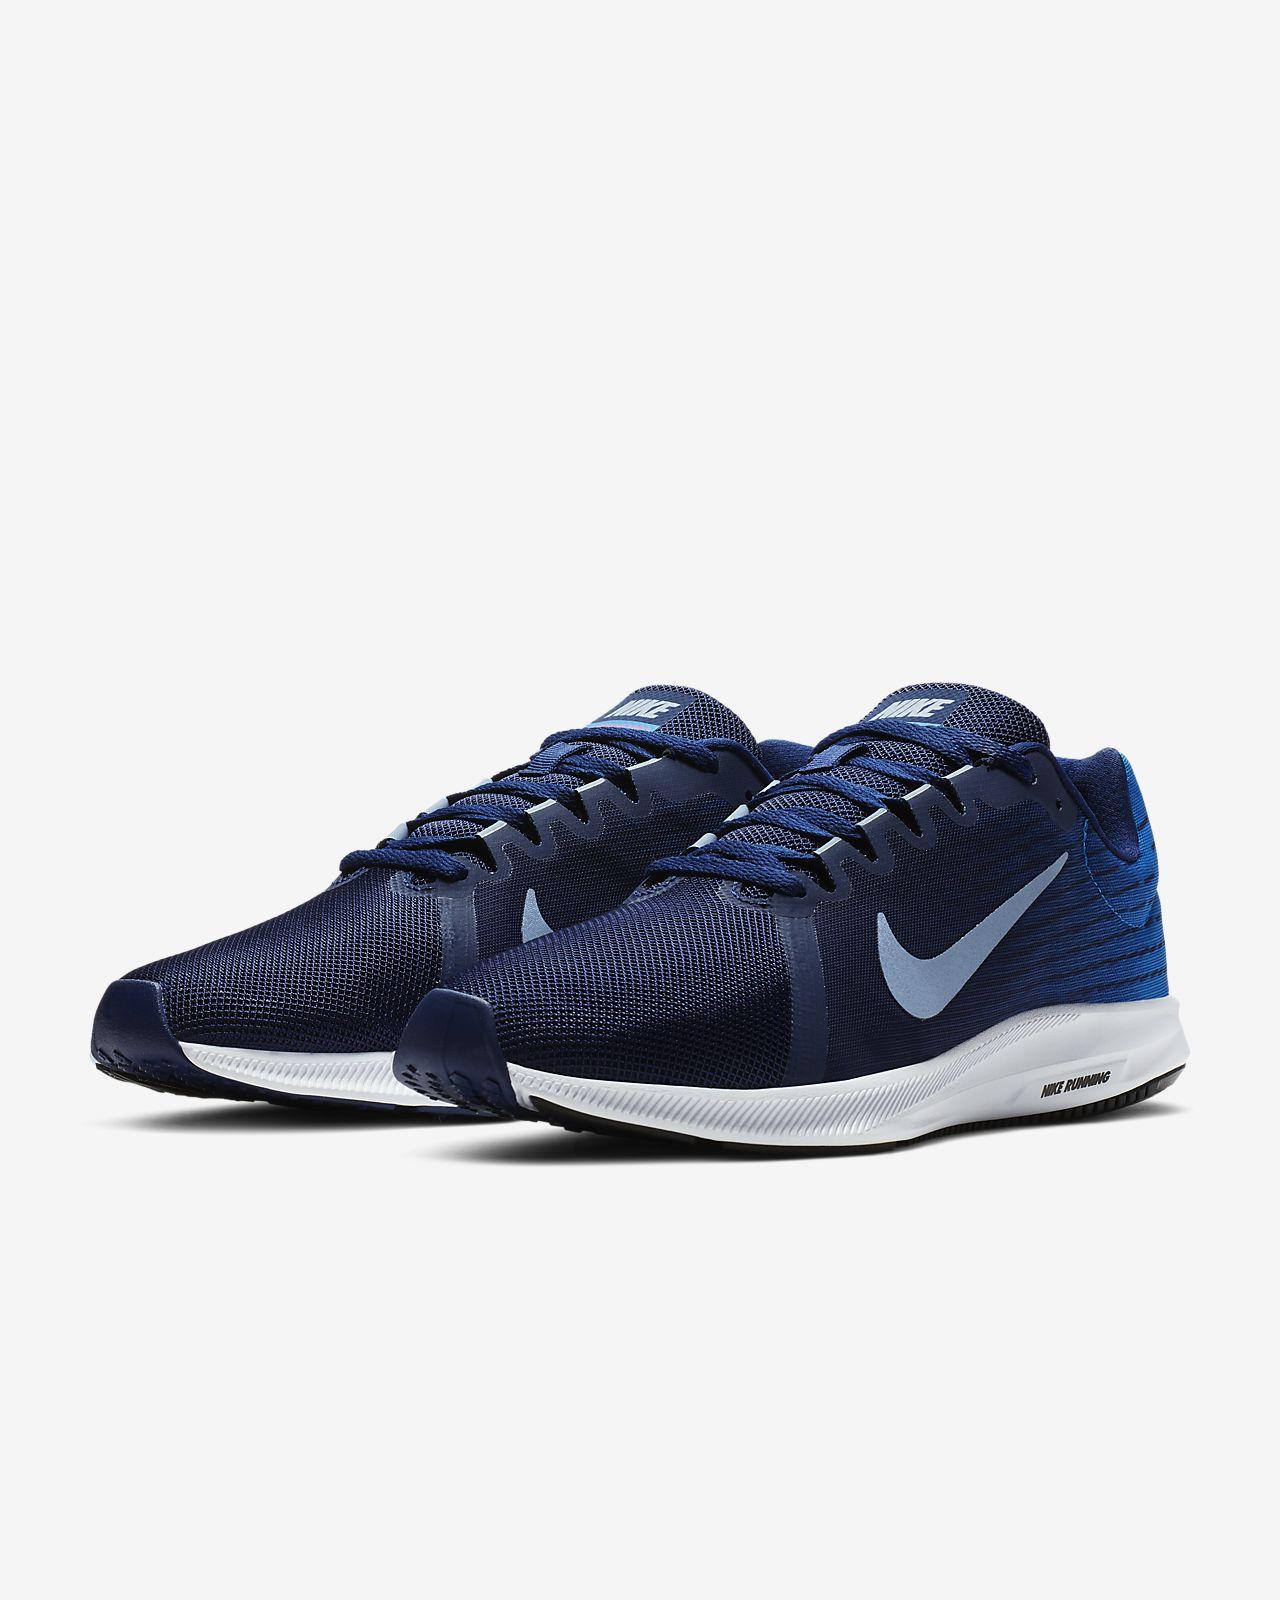 finest selection 38b81 46322 ... Nike Downshifter 8 Men s Running Shoe